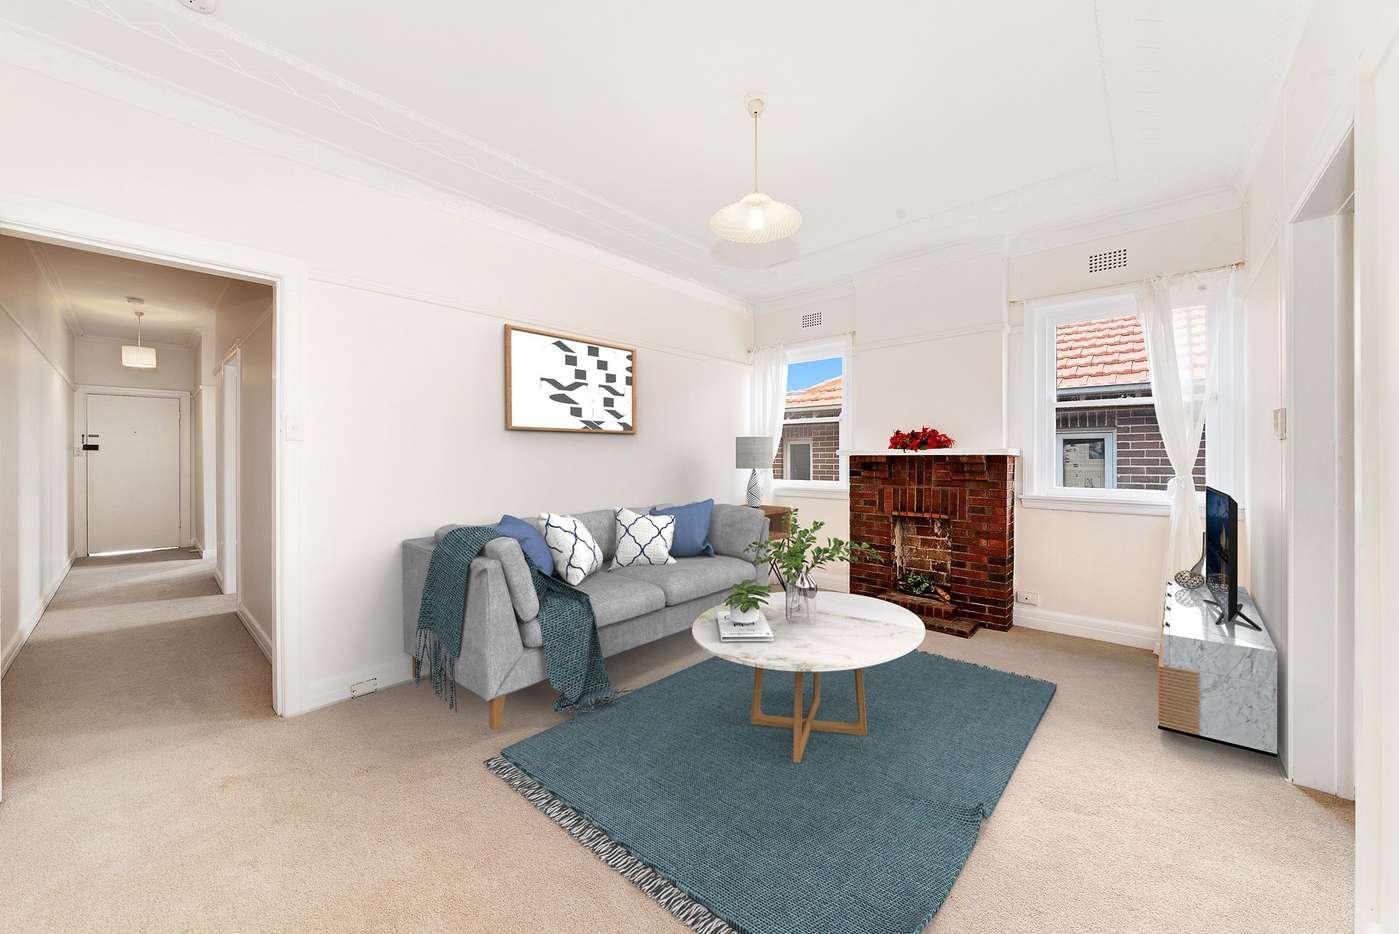 Main view of Homely apartment listing, 3/28 Orlando Avenue, Mosman, NSW 2088